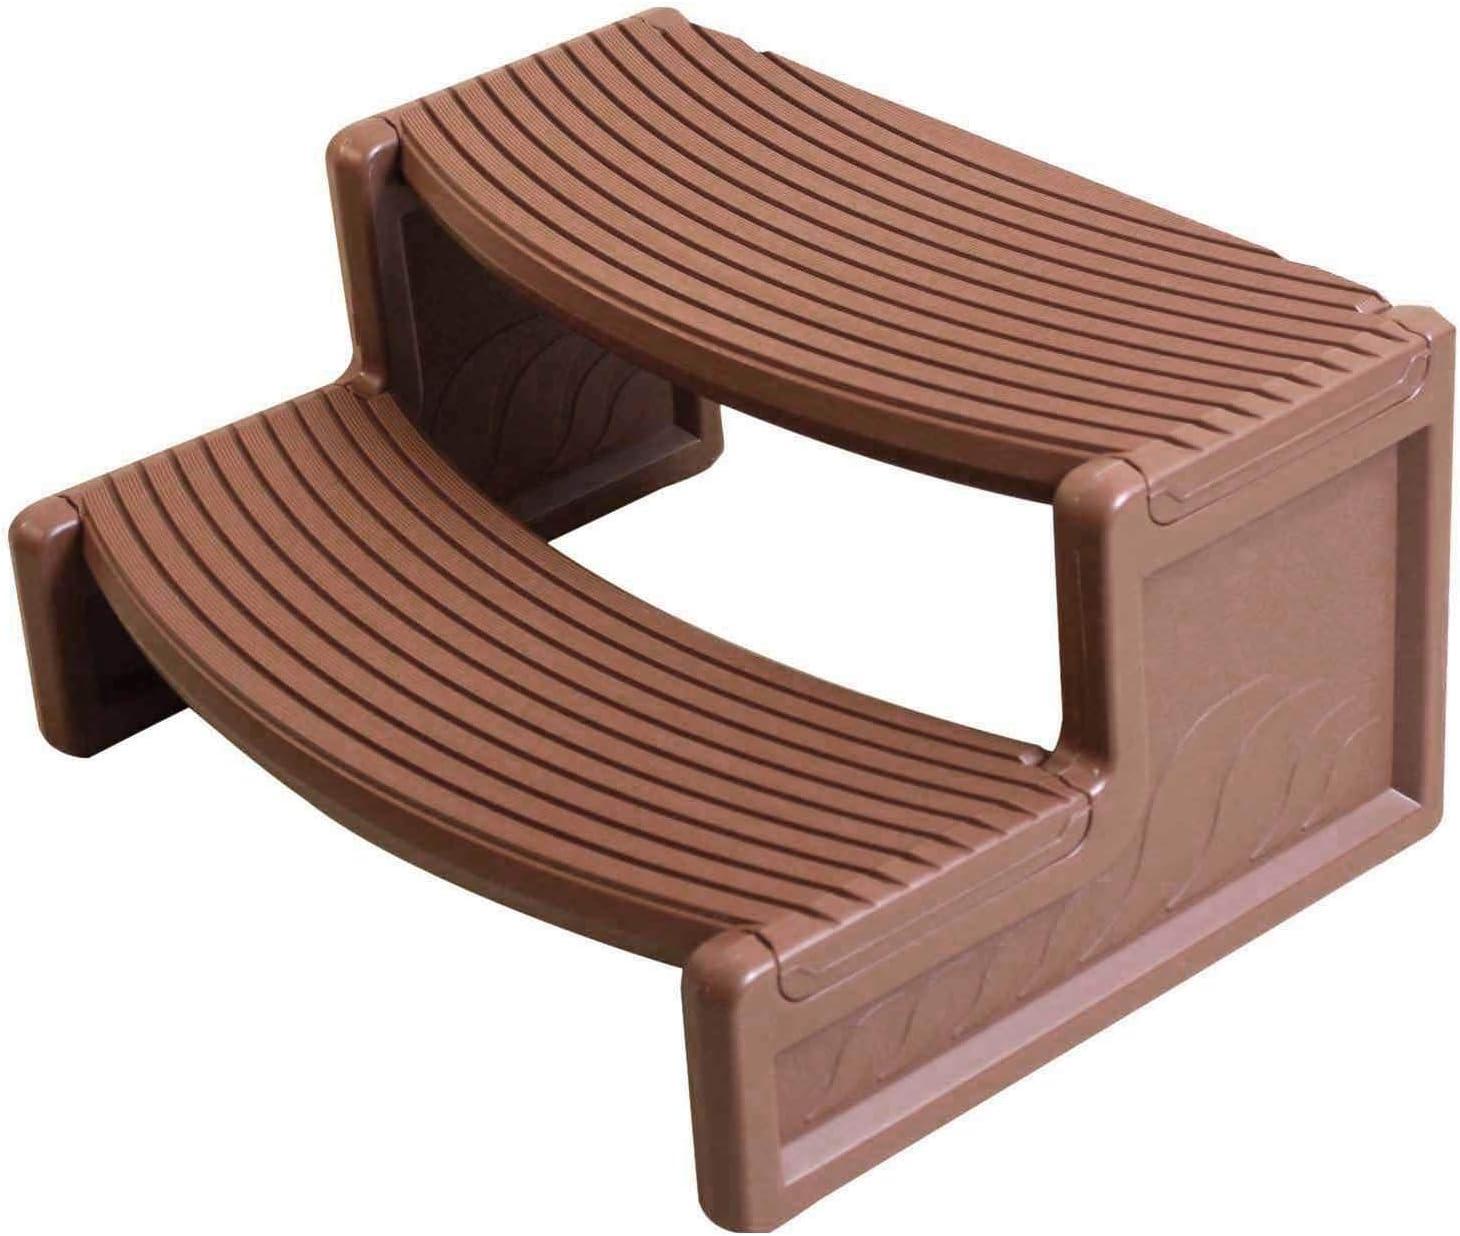 Amazon Com Confer Plastics Resin Multi Purpose Spa And Hot Tub Handi Step Steps Medium Red Garden Outdoor